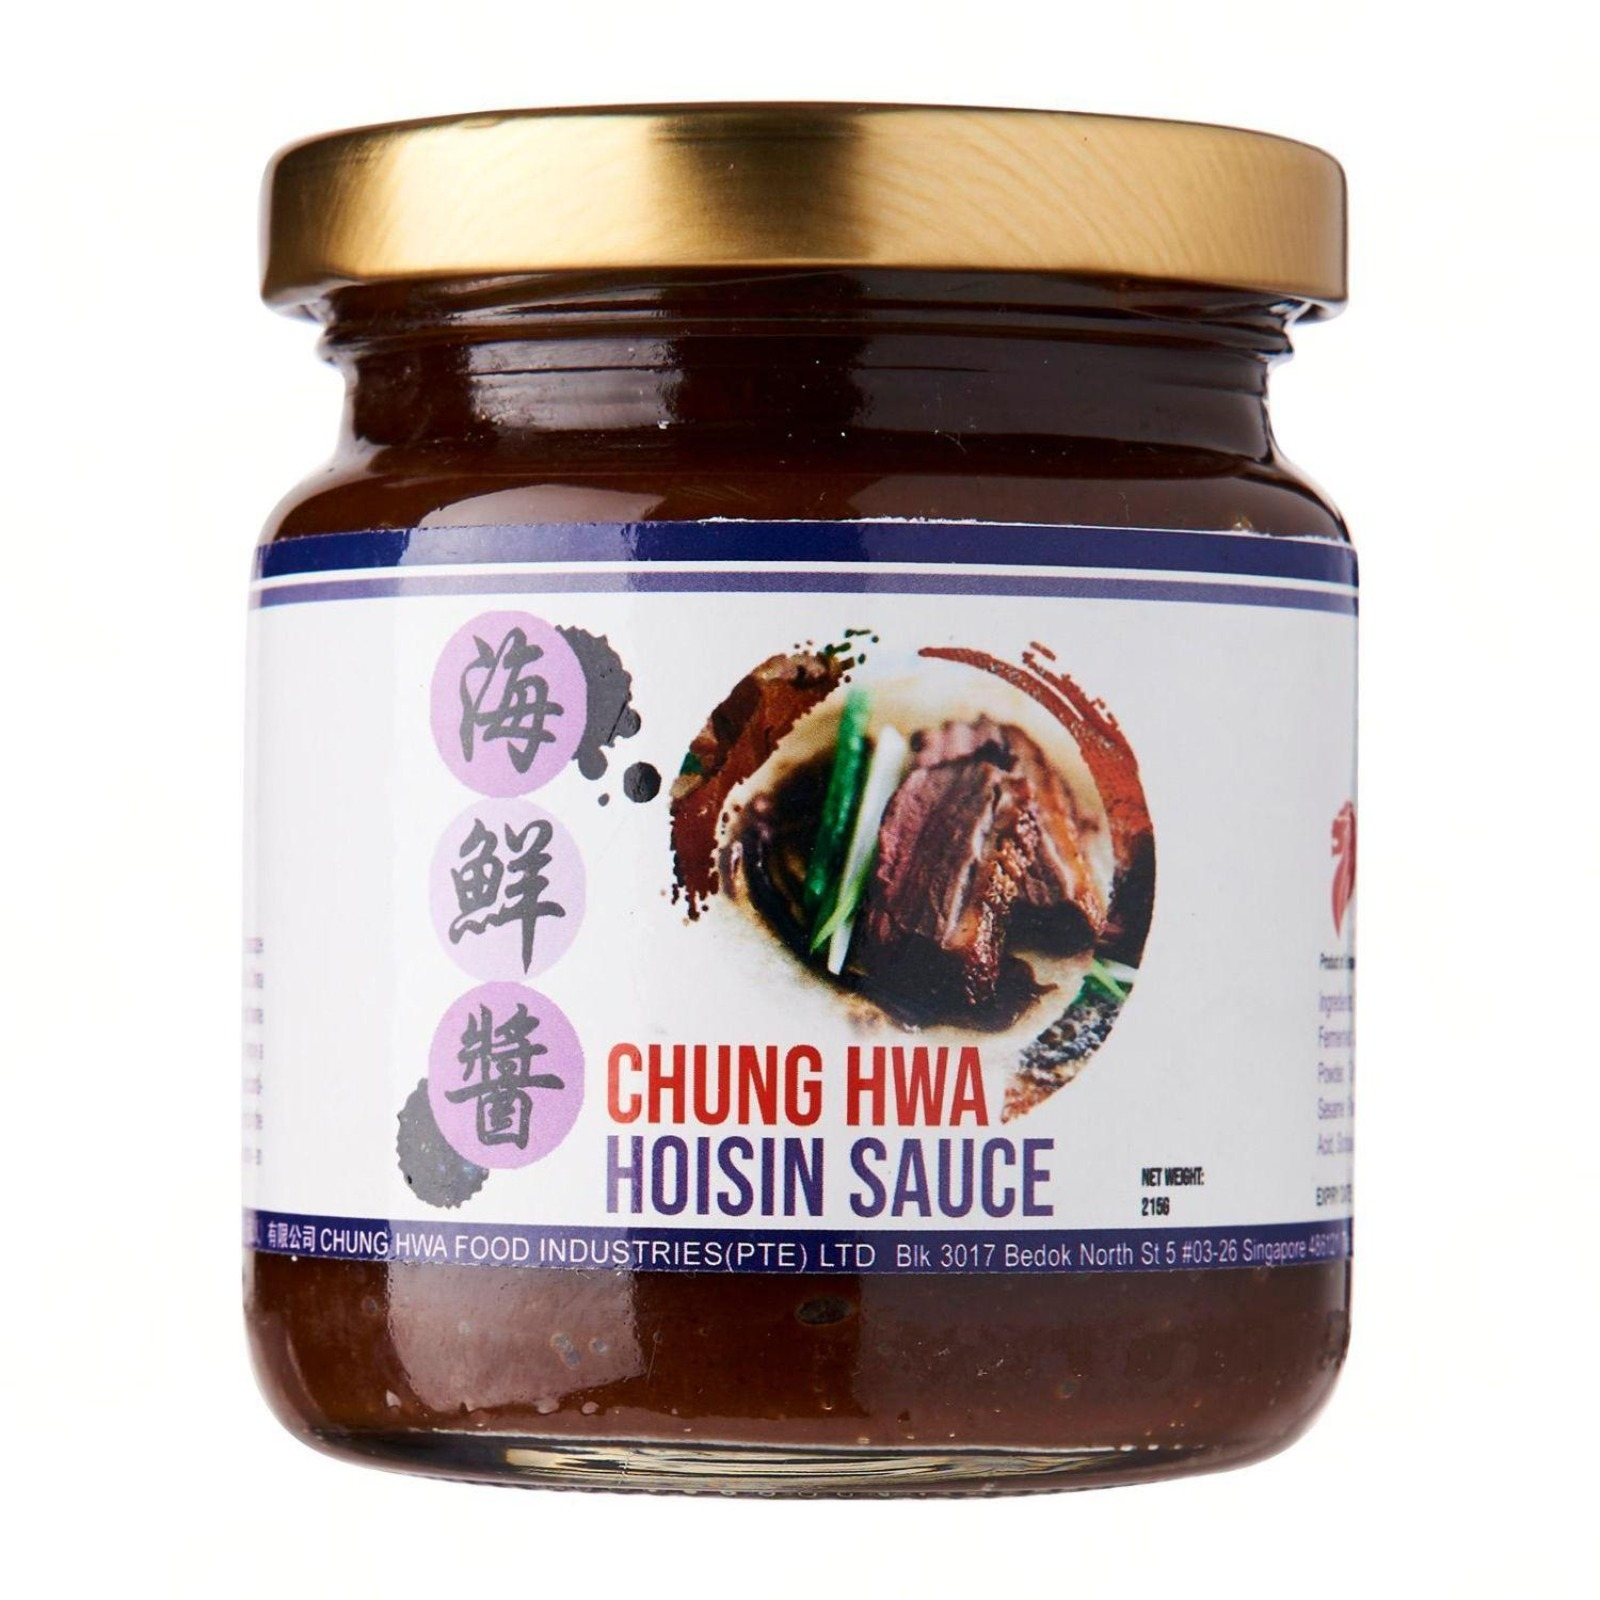 Chung Hwa Sauce - Hoisin Sauce